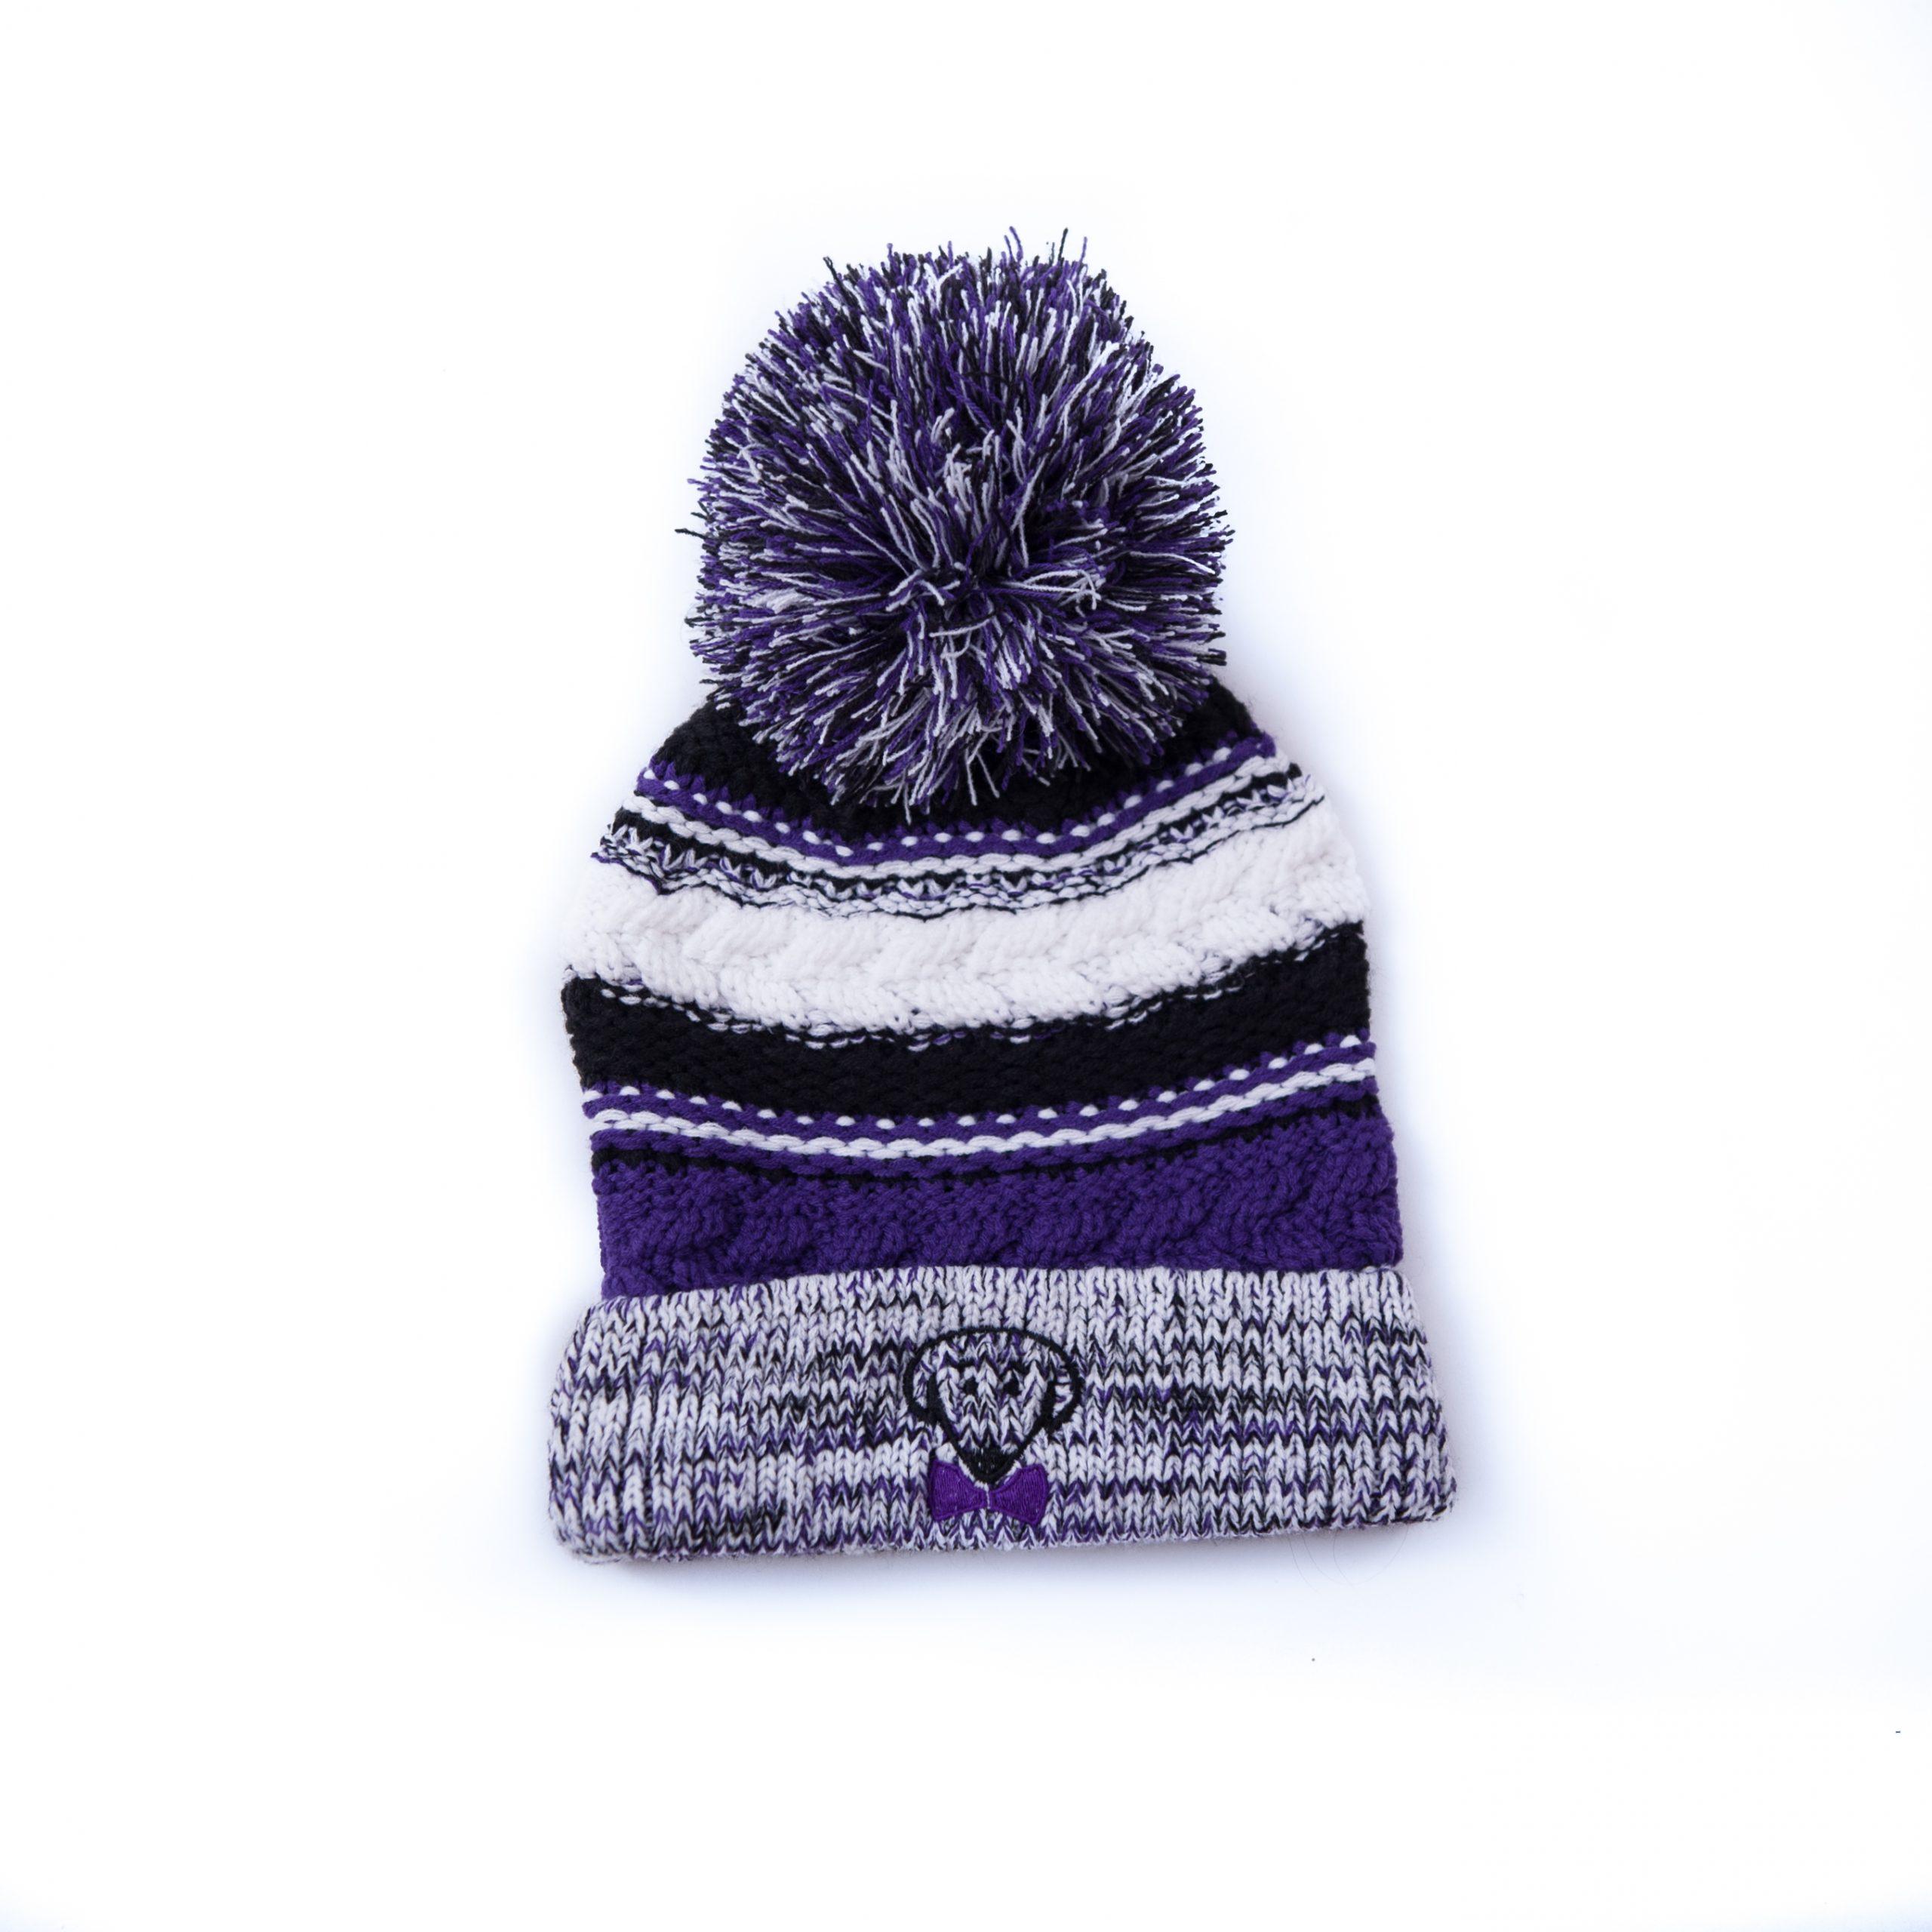 Beau Tyler Riley winter knit purple, black, and white hat – Stay Warm, Look Cute